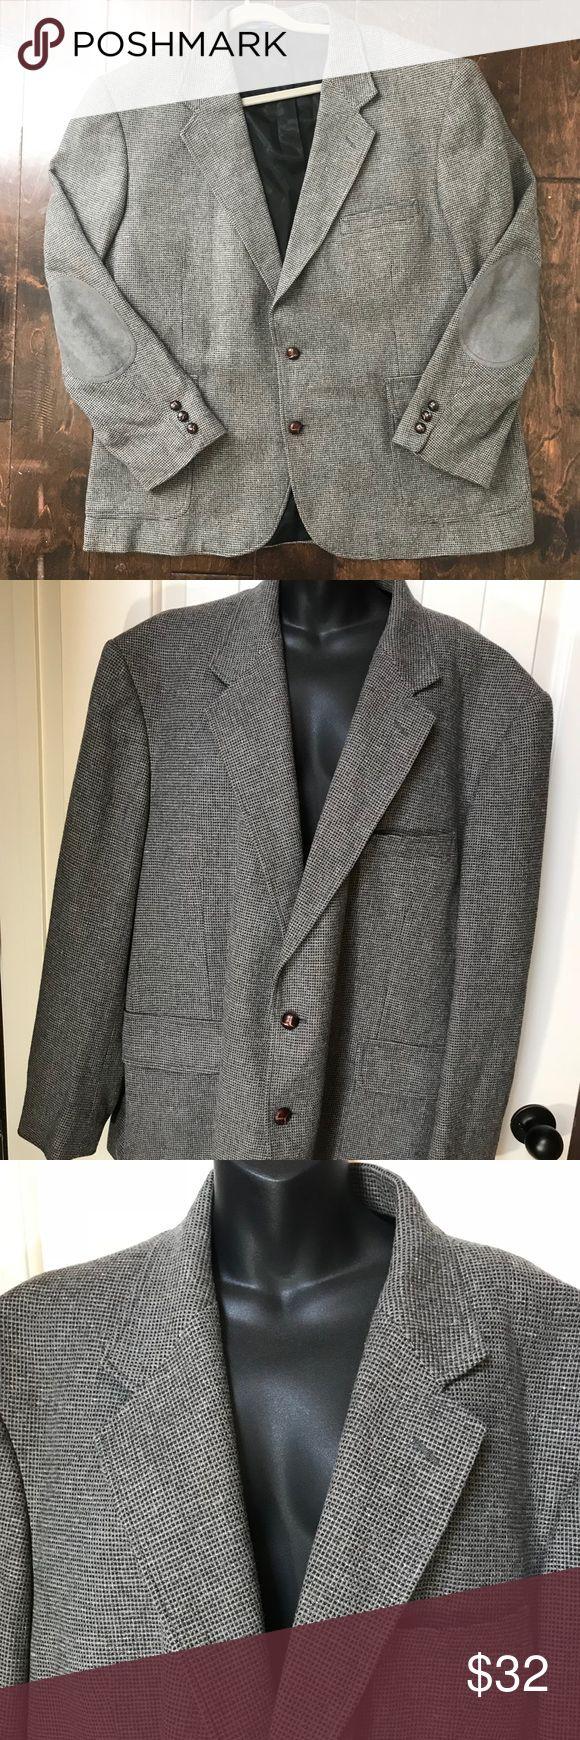 Vintage Pendleton Men Wool Blazer Elbow Patches 48 Vintage